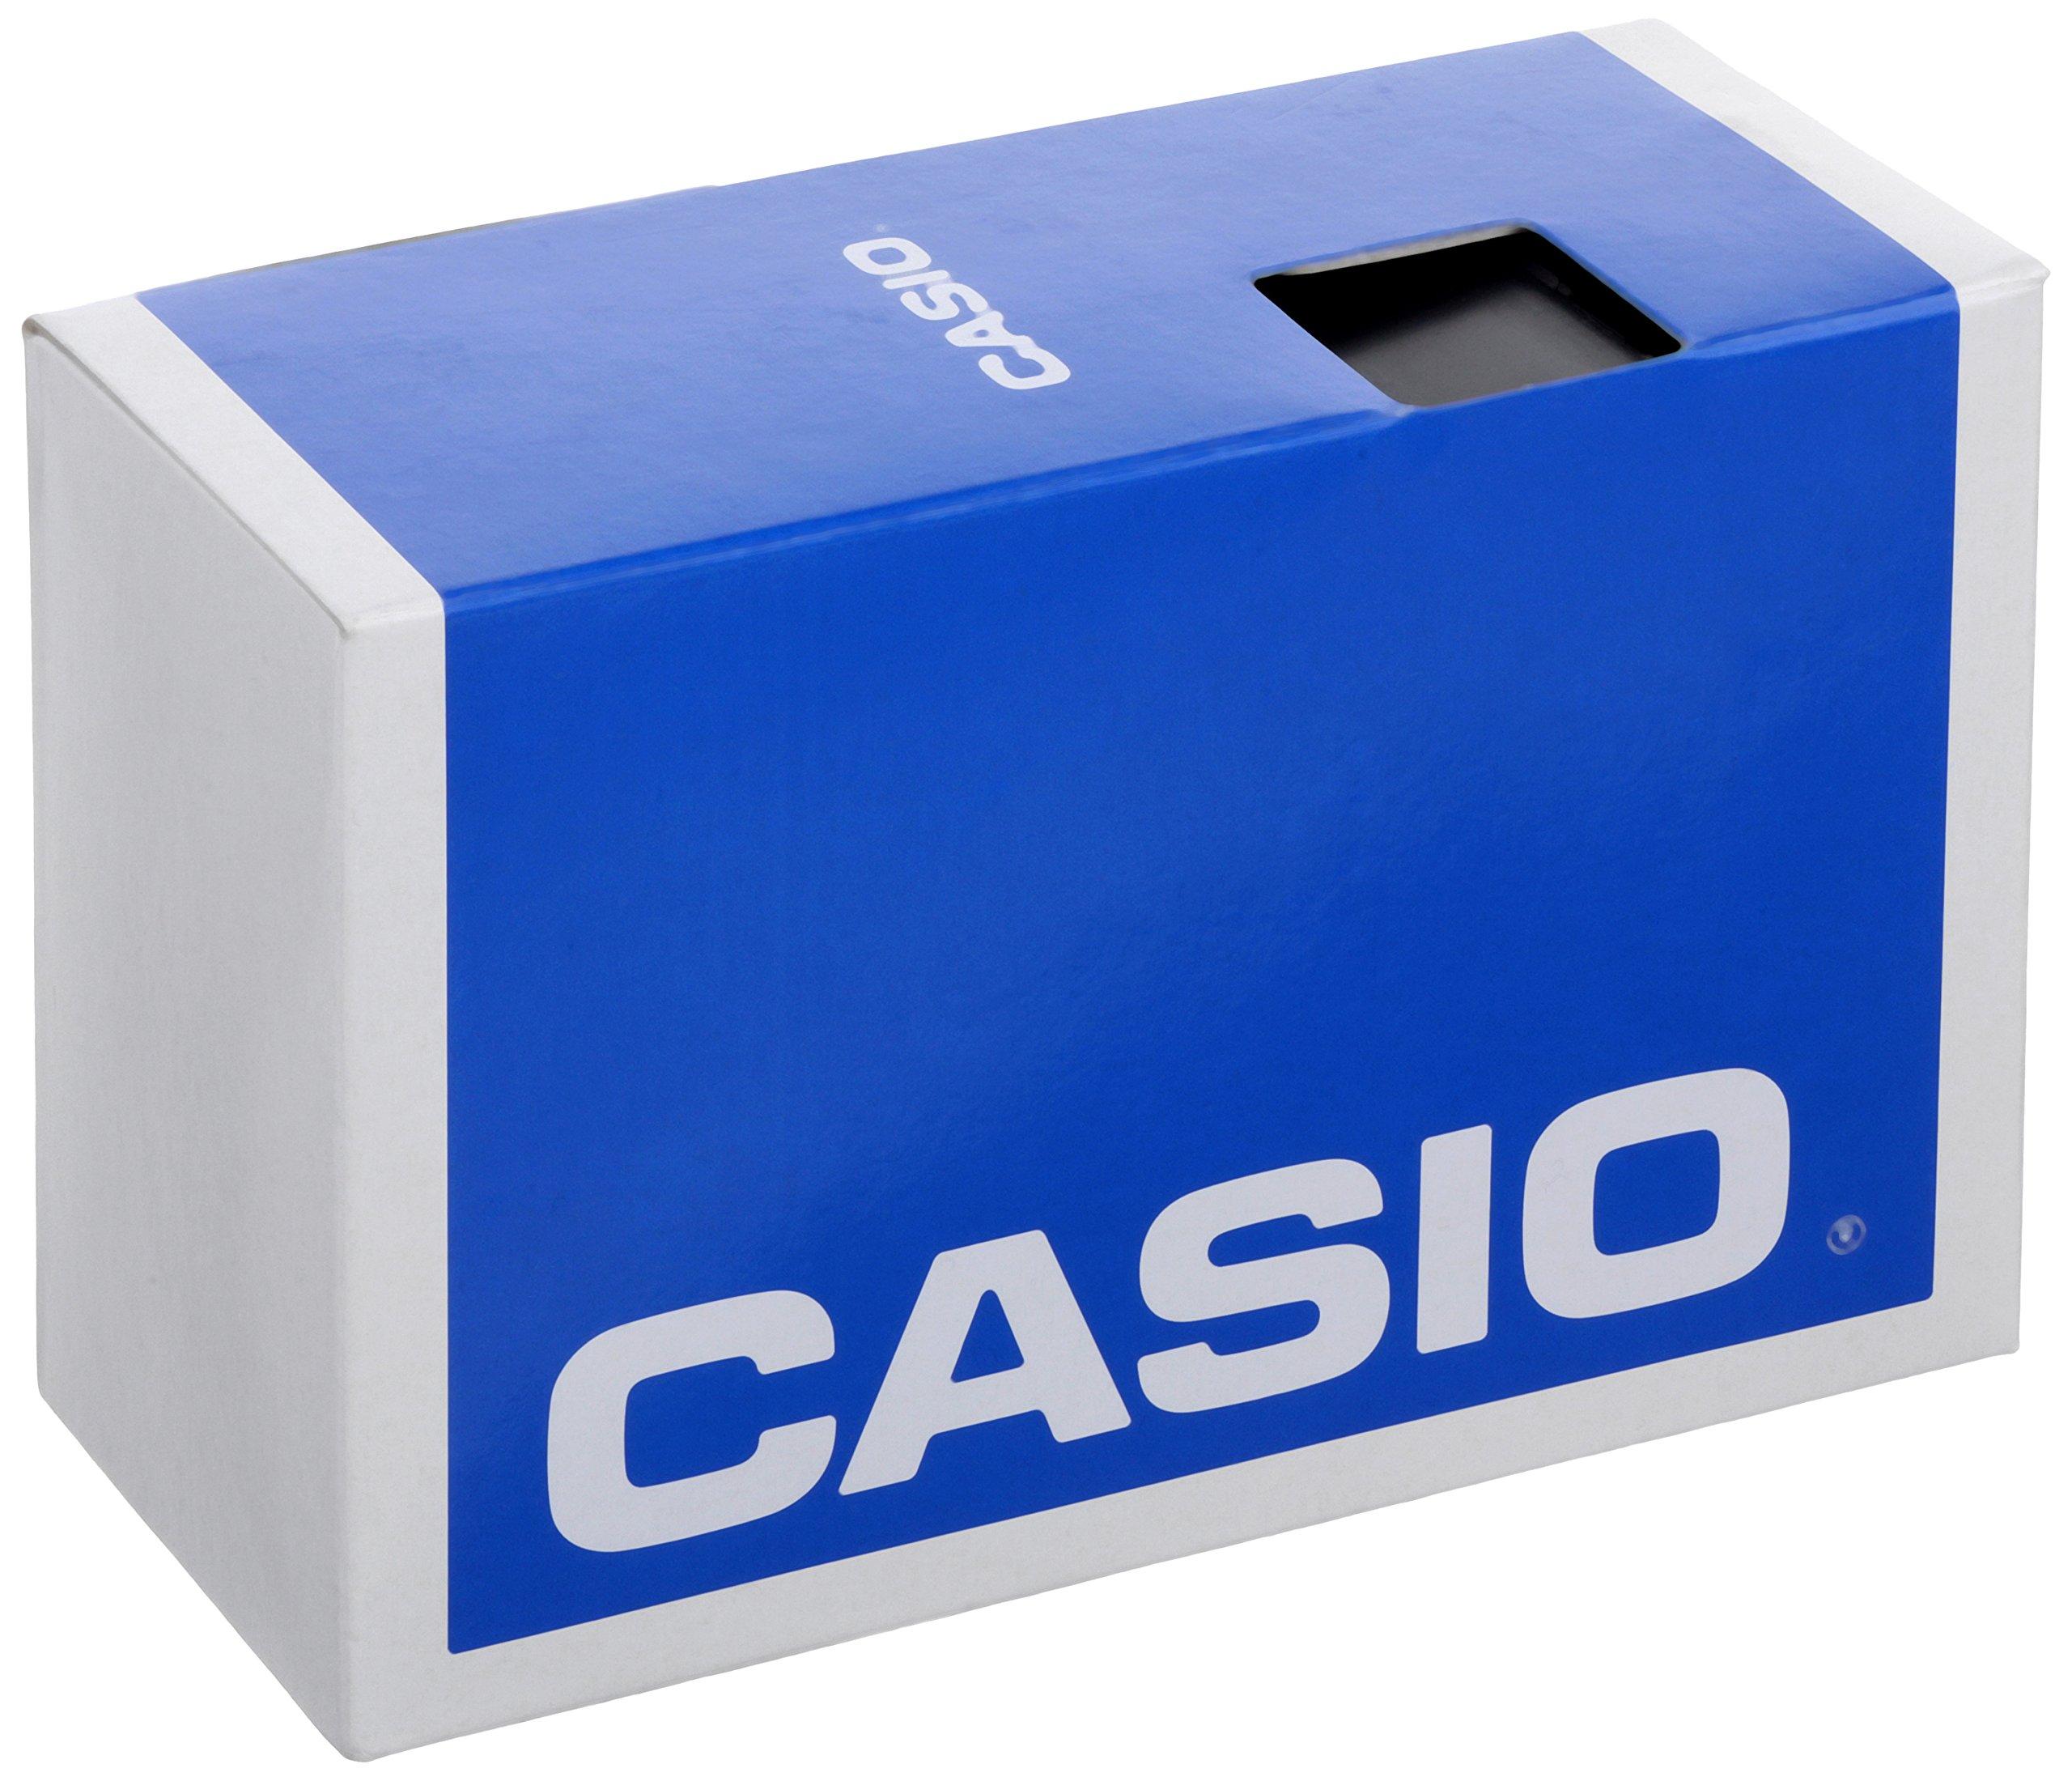 Casio Men's Sports Quartz Watch with Resin Strap, Black, 28.6 (Model: AEQ110W-1AV) by Casio (Image #3)